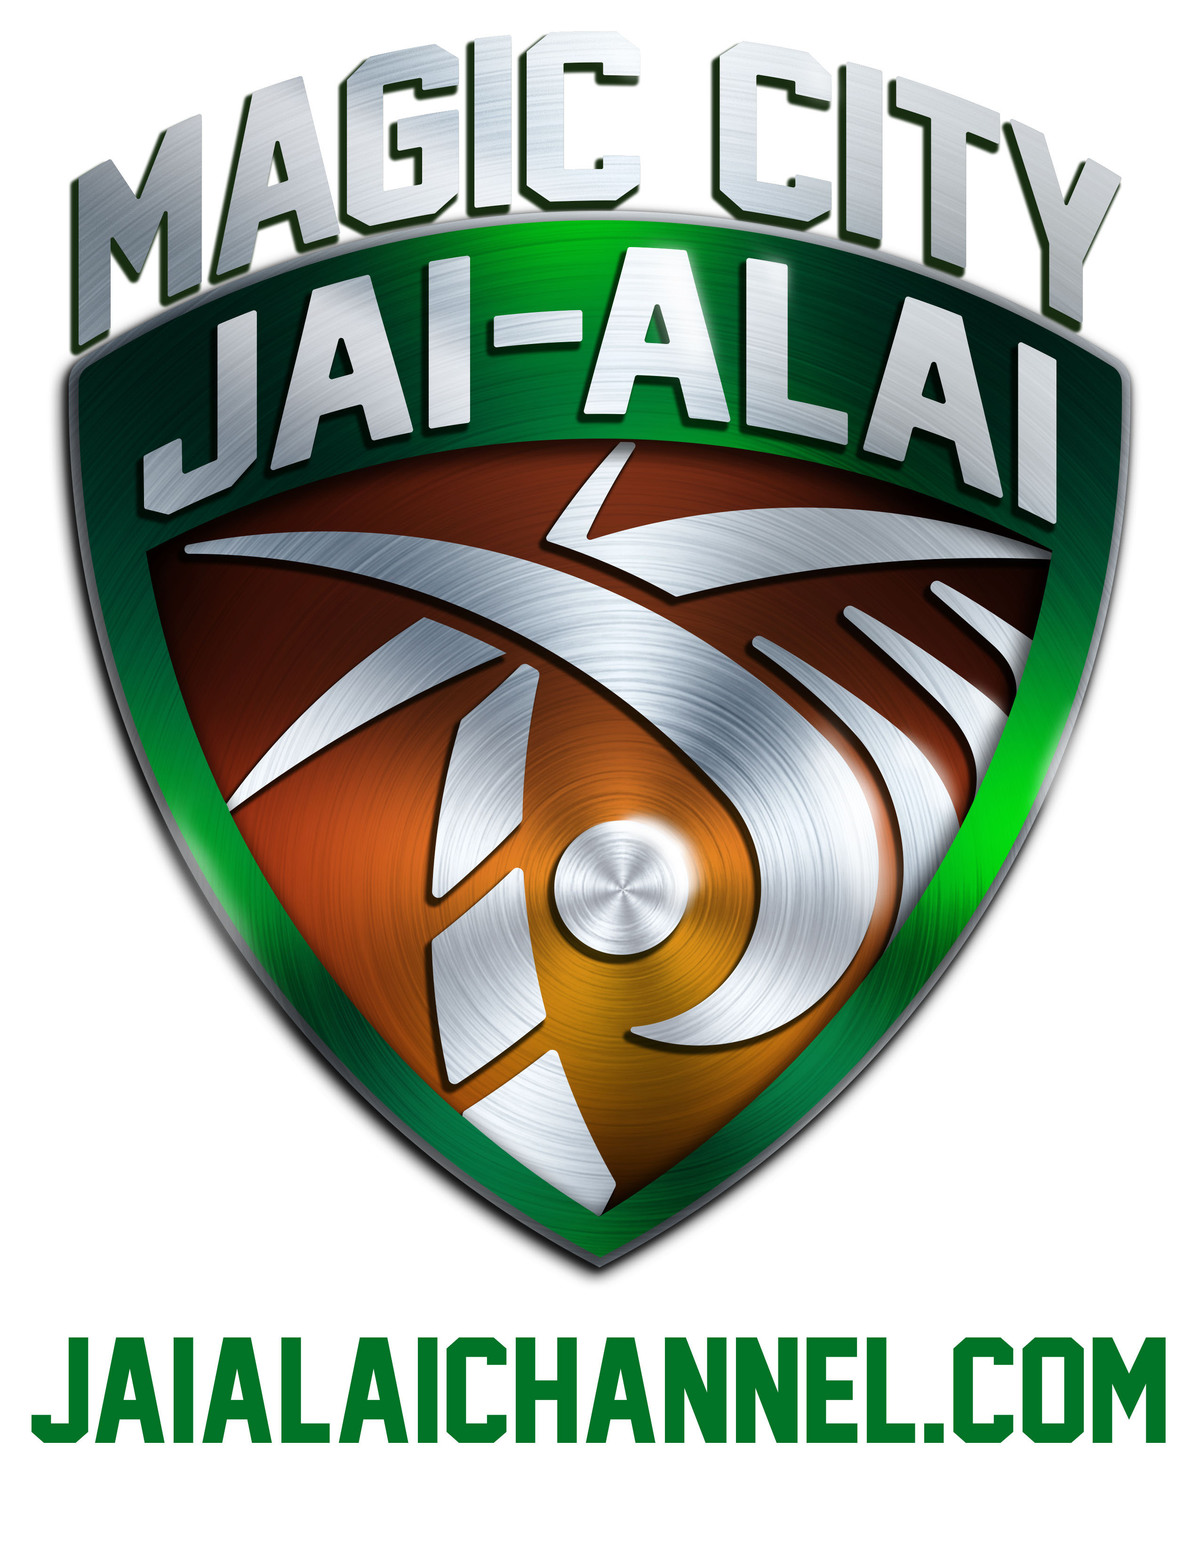 Jai-Alai H2H - Doubles H2H - Sat. Jun 5, 2021